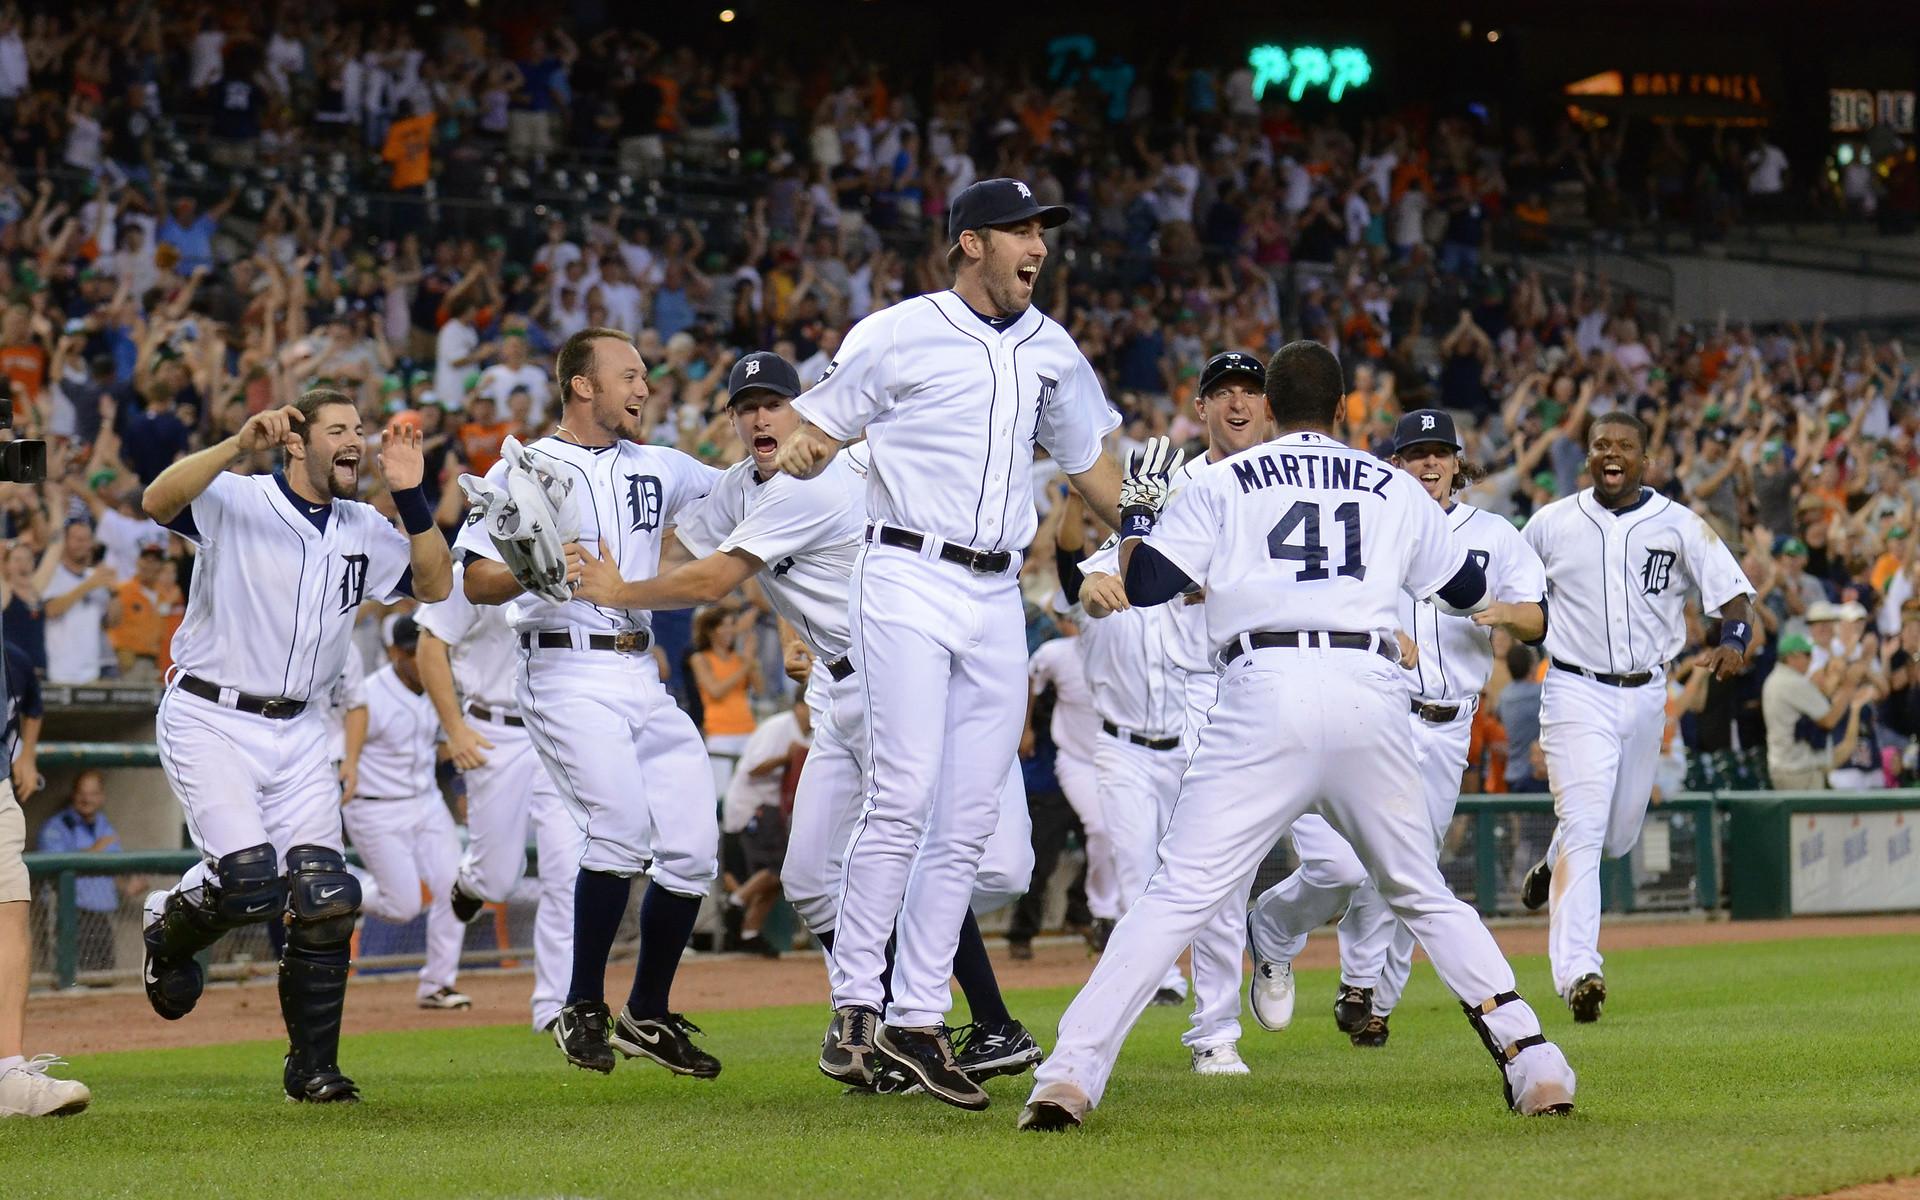 Baseball, Mlb, Sports, Detroit Tigers Team, Detroit Tigers